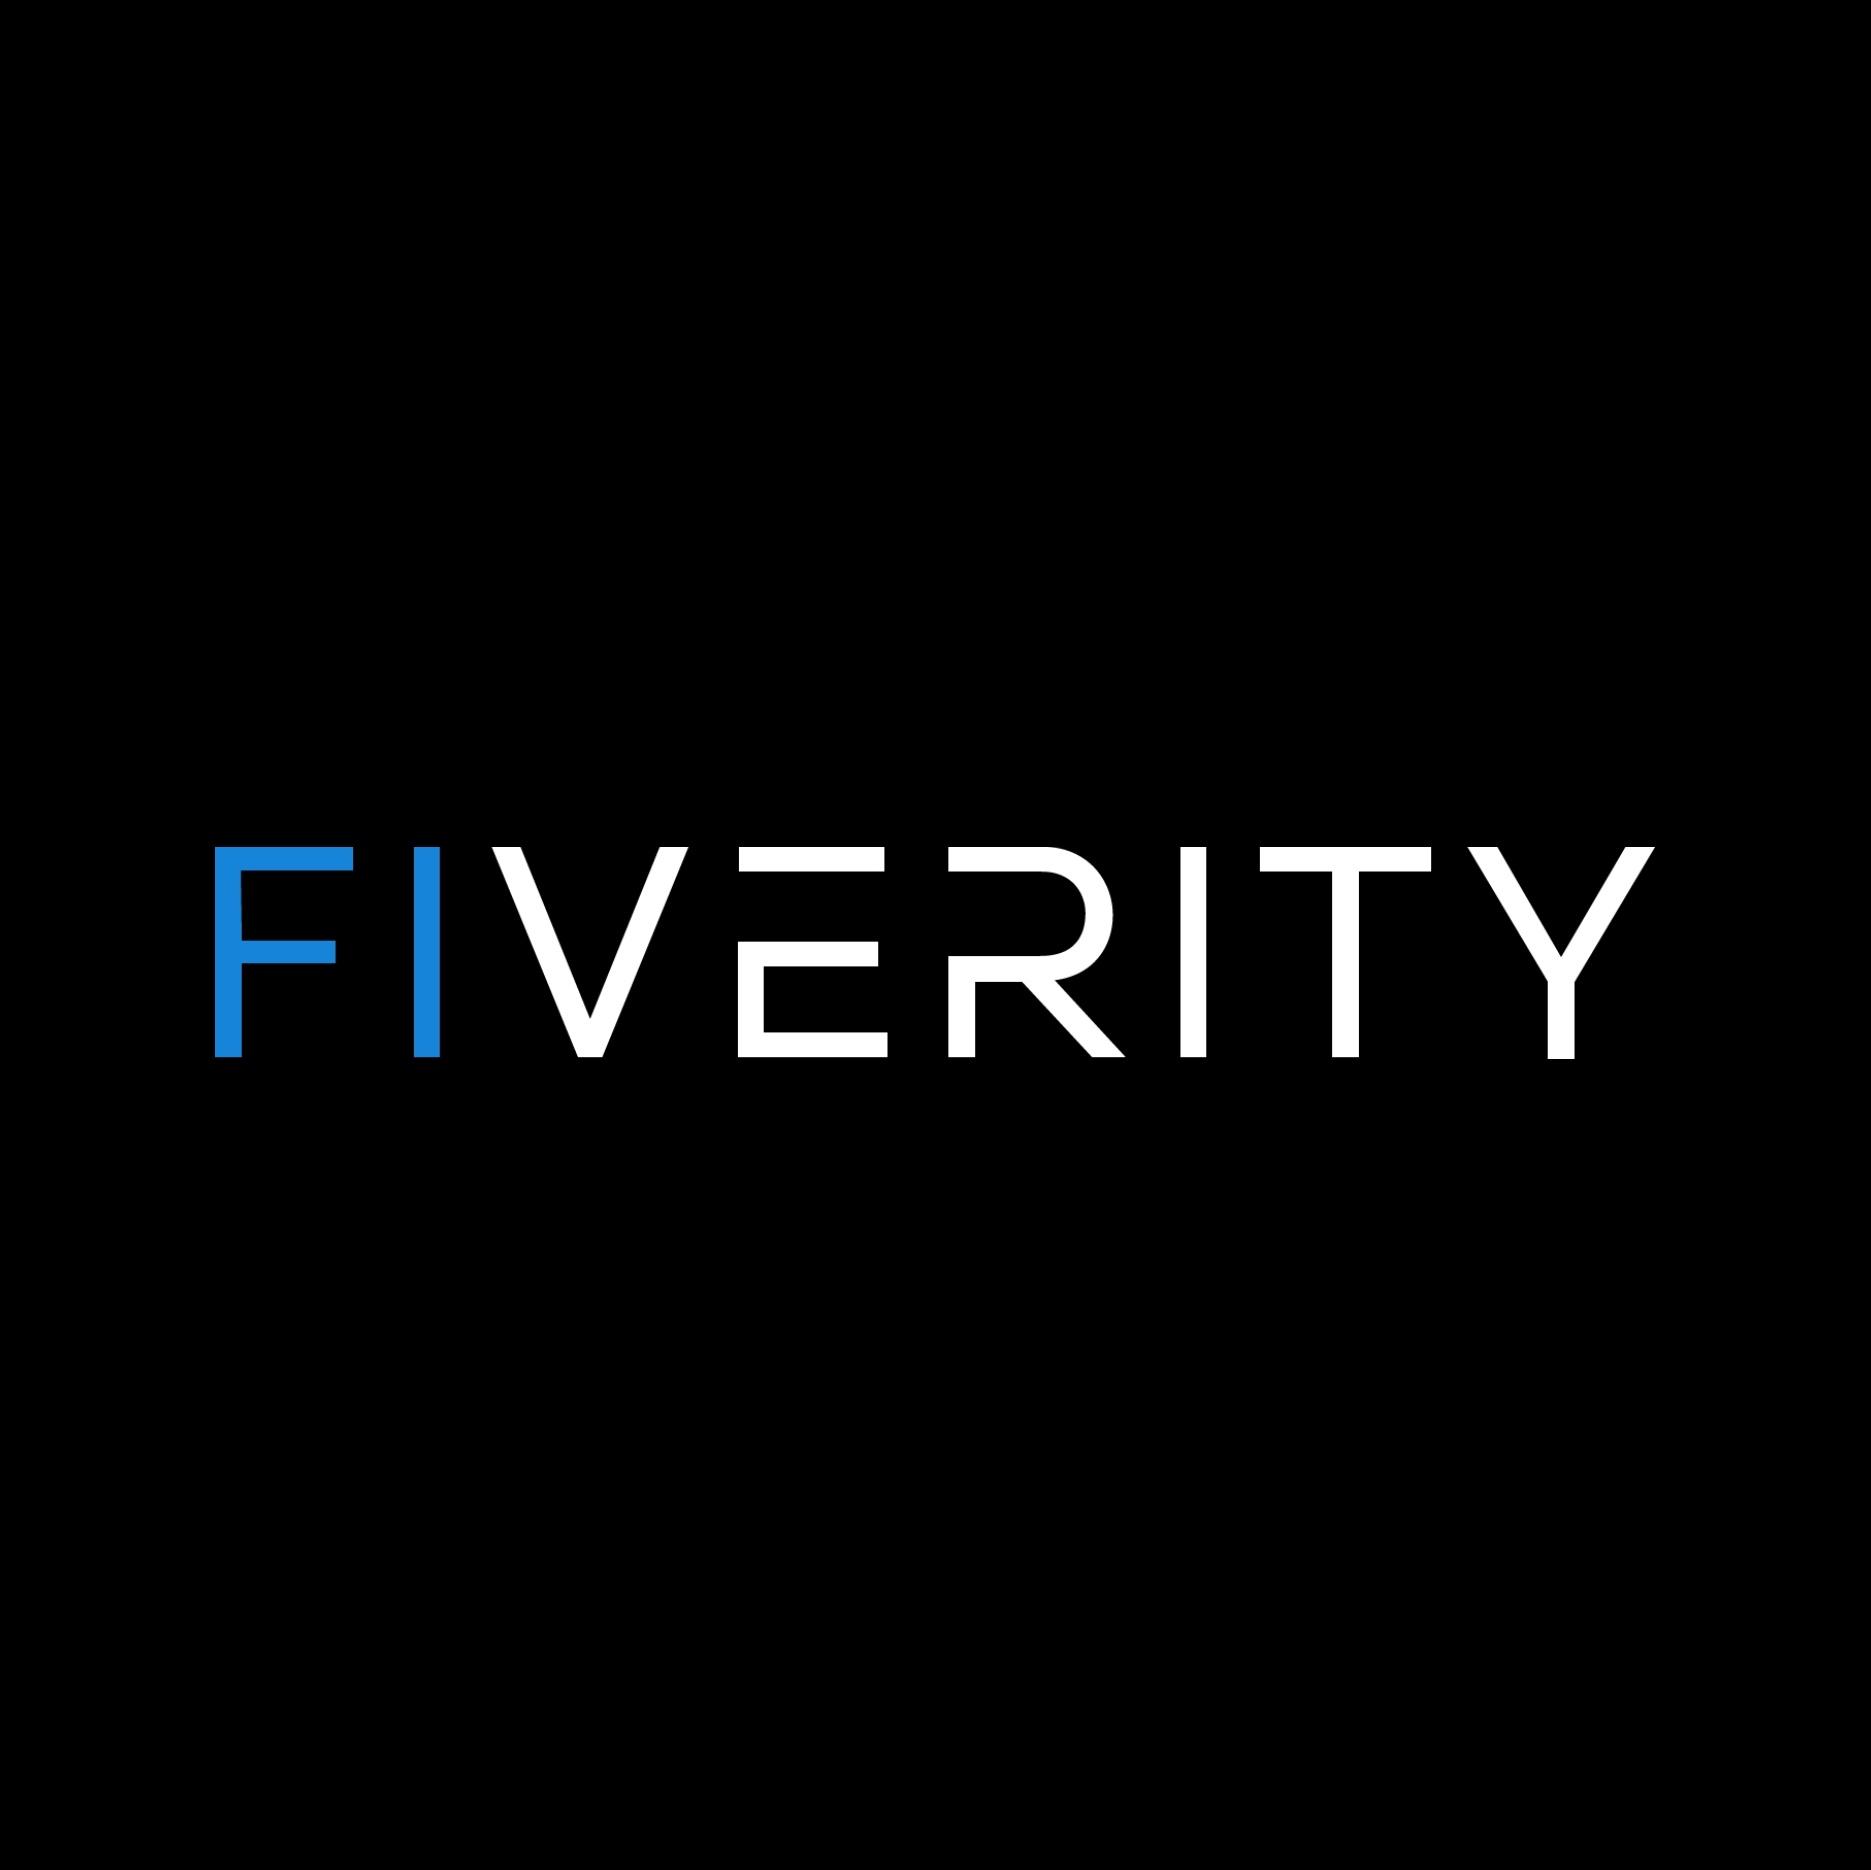 FiVerity logo